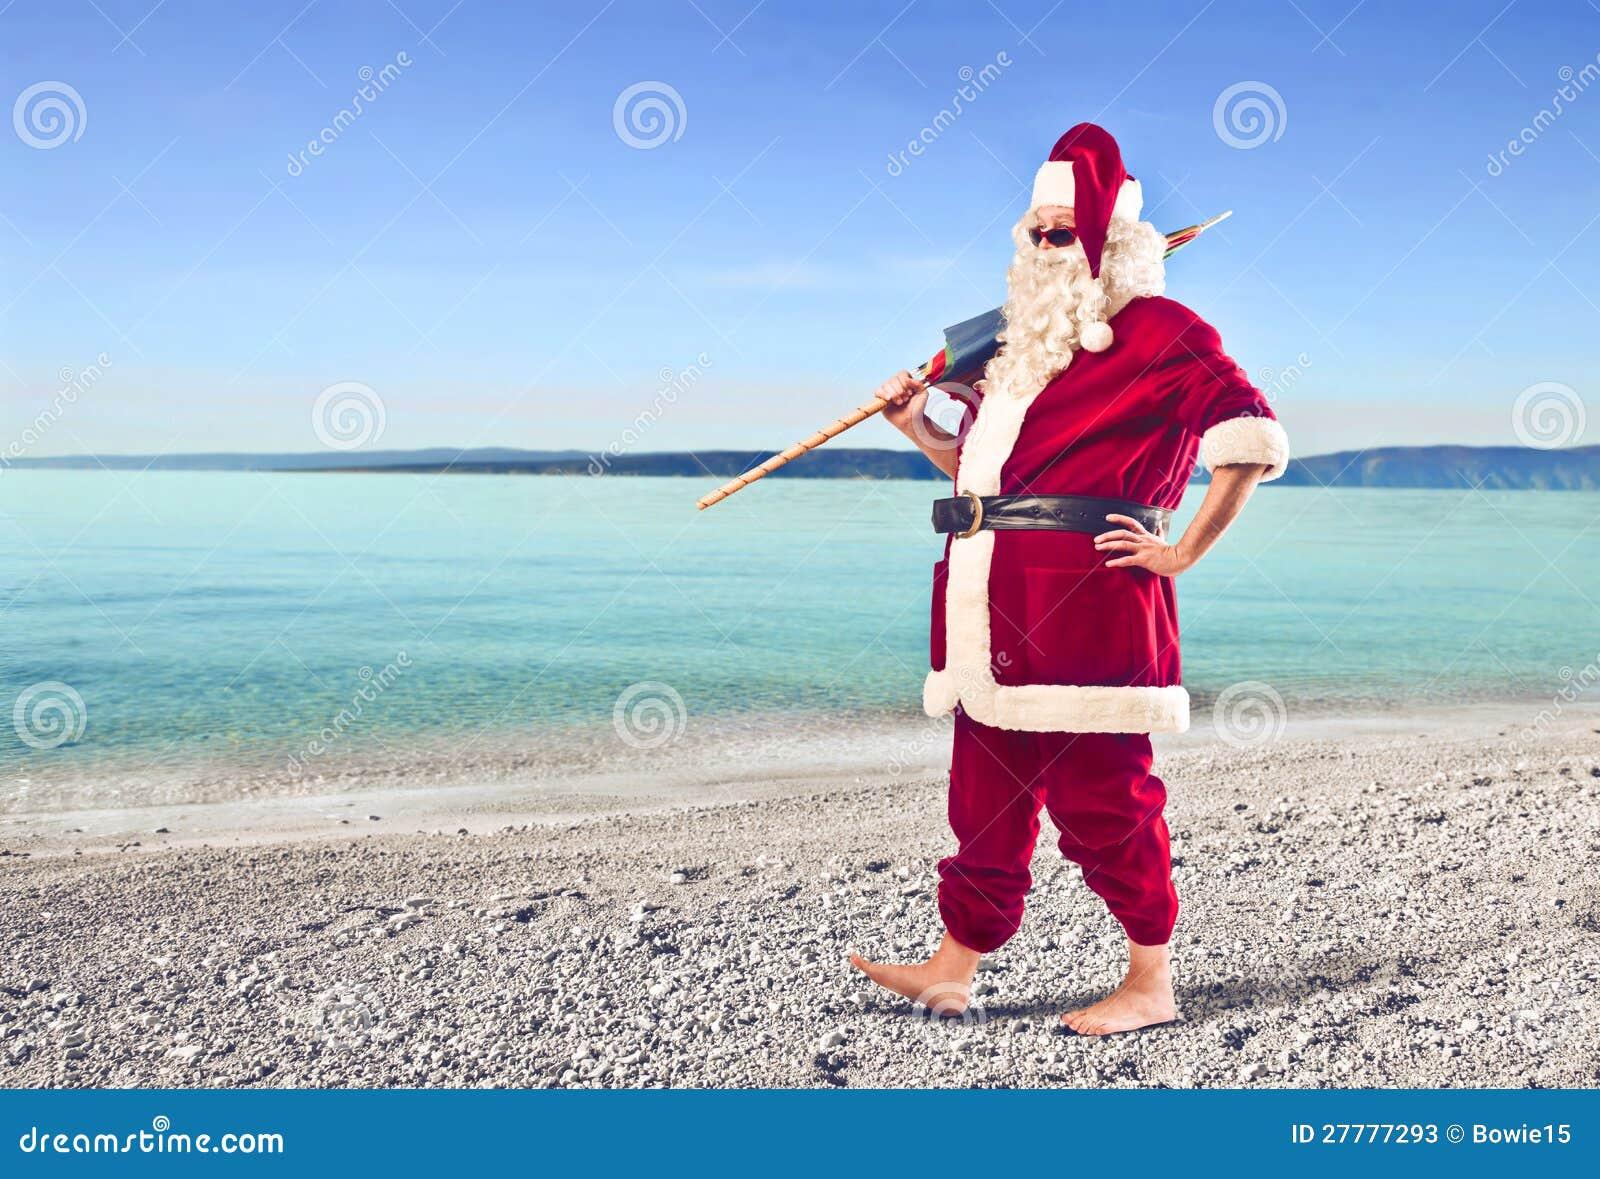 free clipart santa on the beach - photo #41